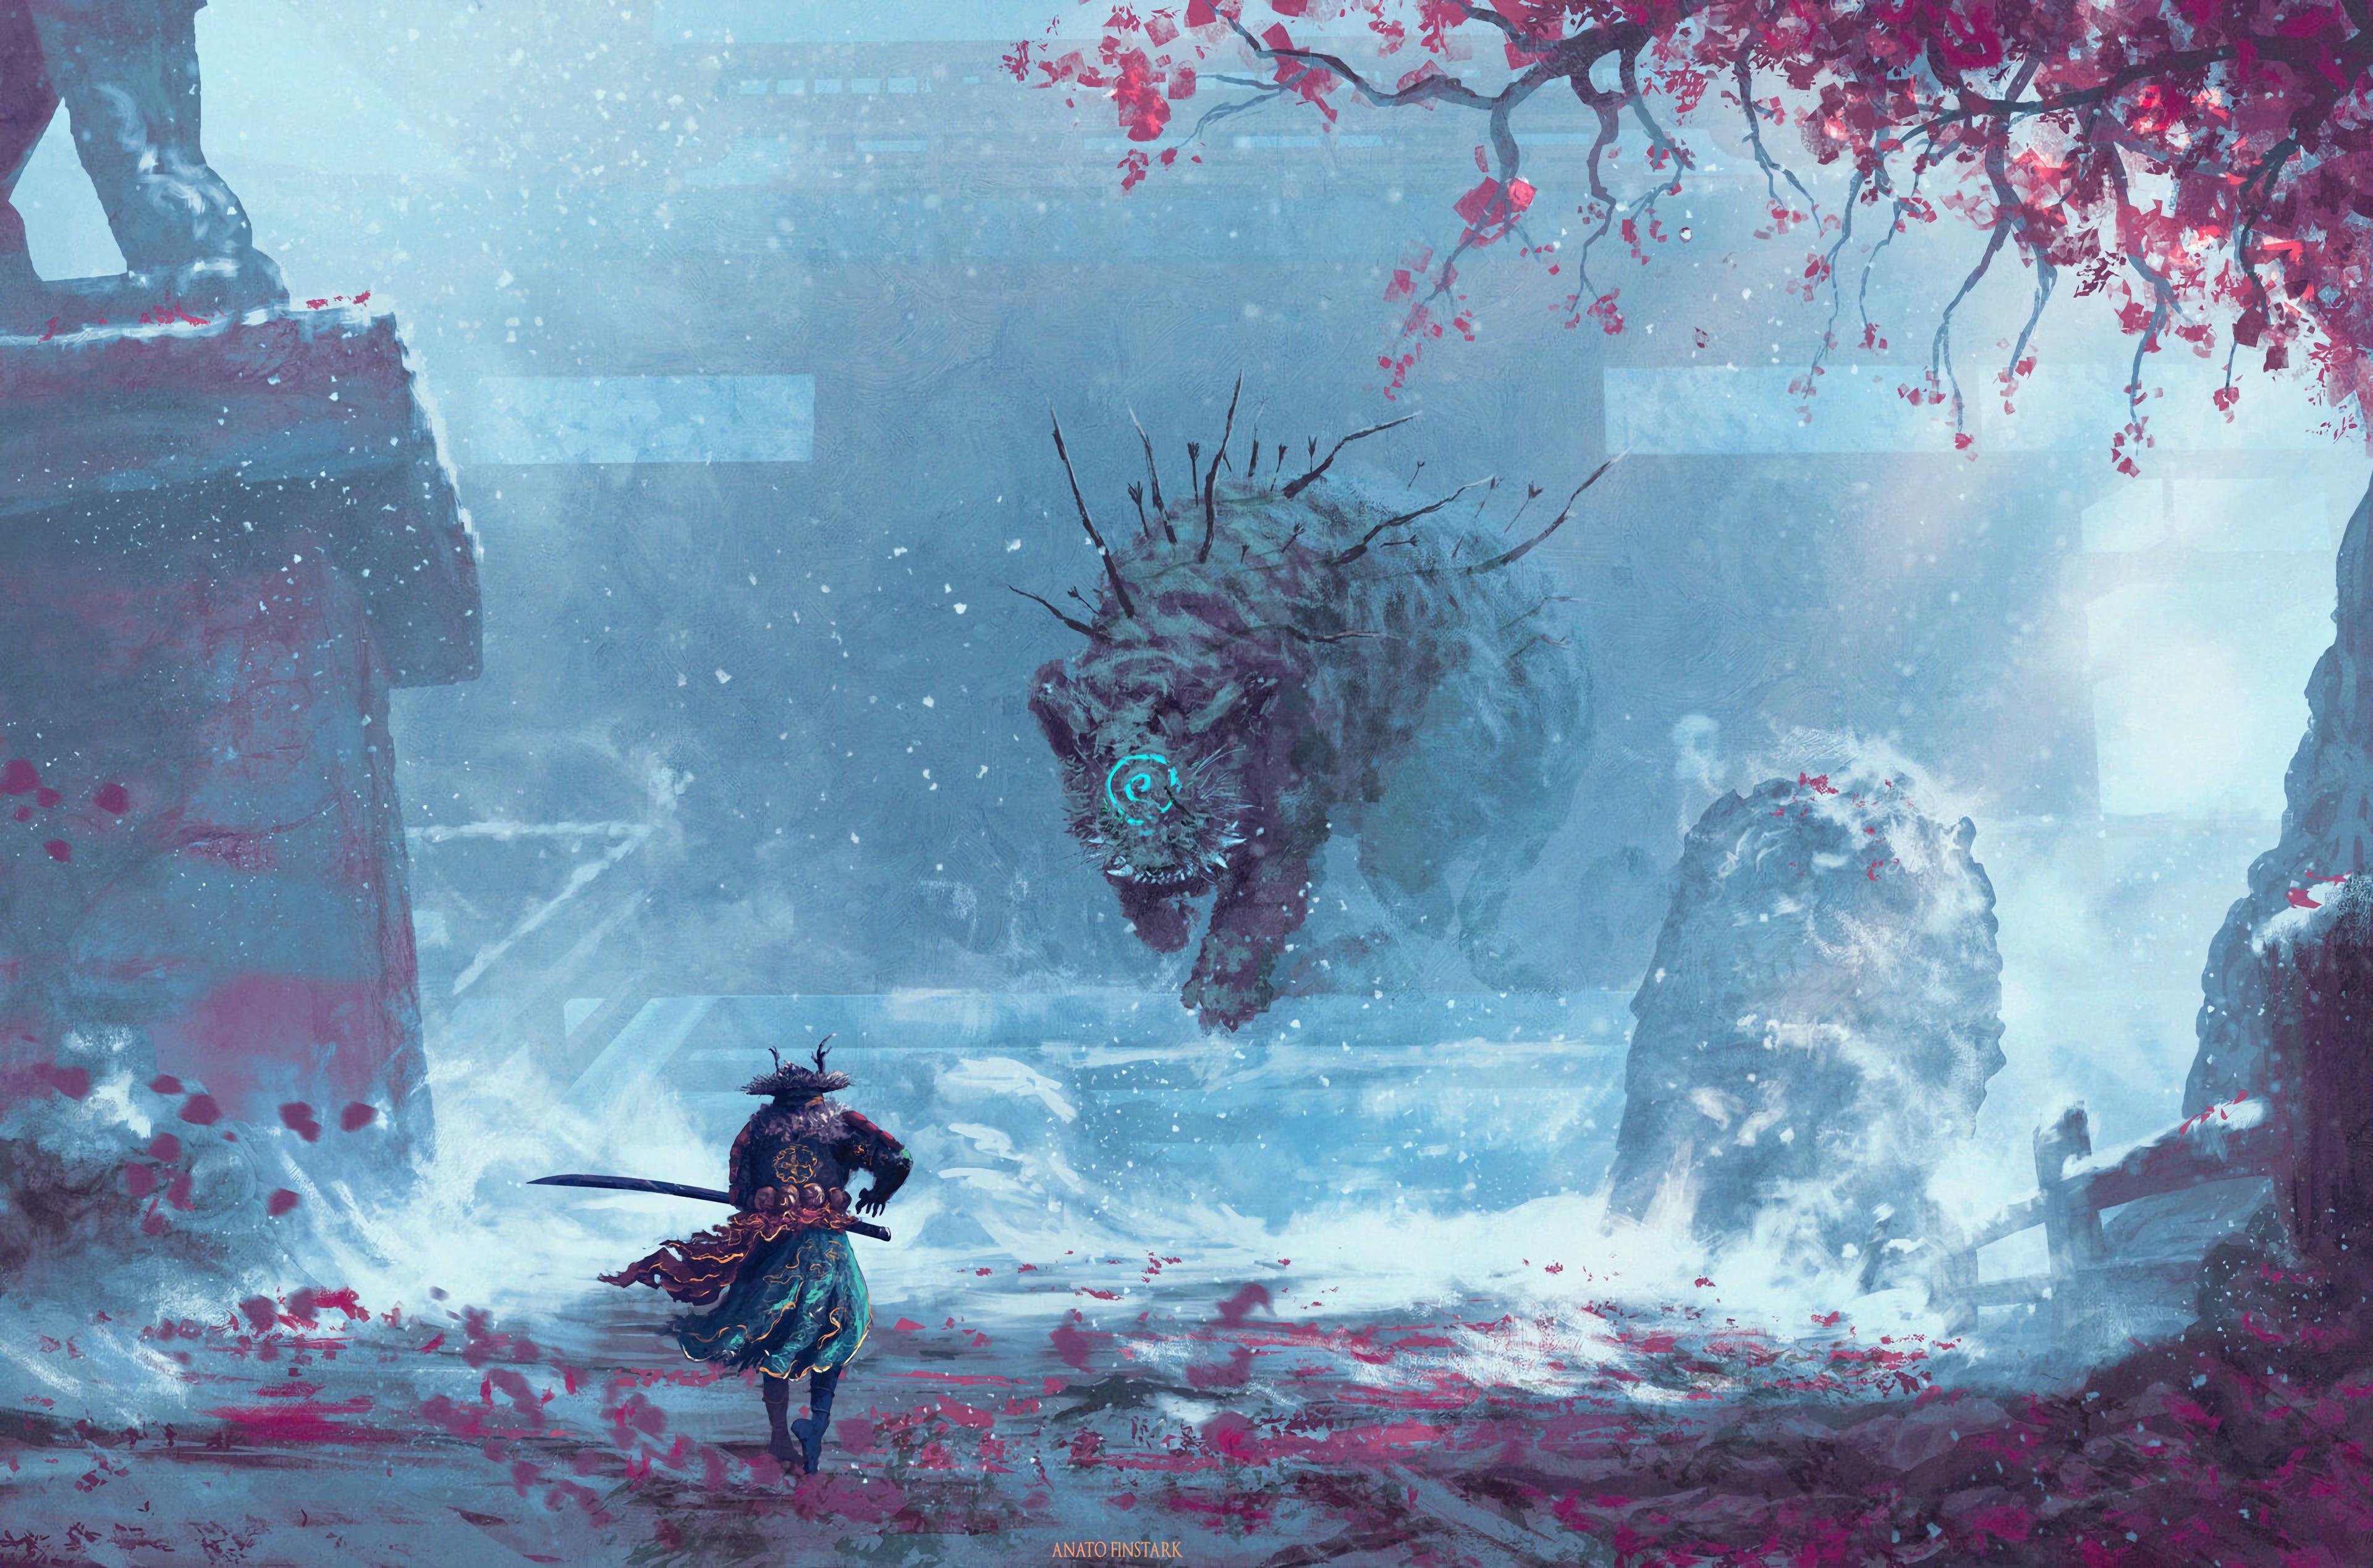 Sekiro Shadows Die Twice 4k Game Art Hd Games 4k